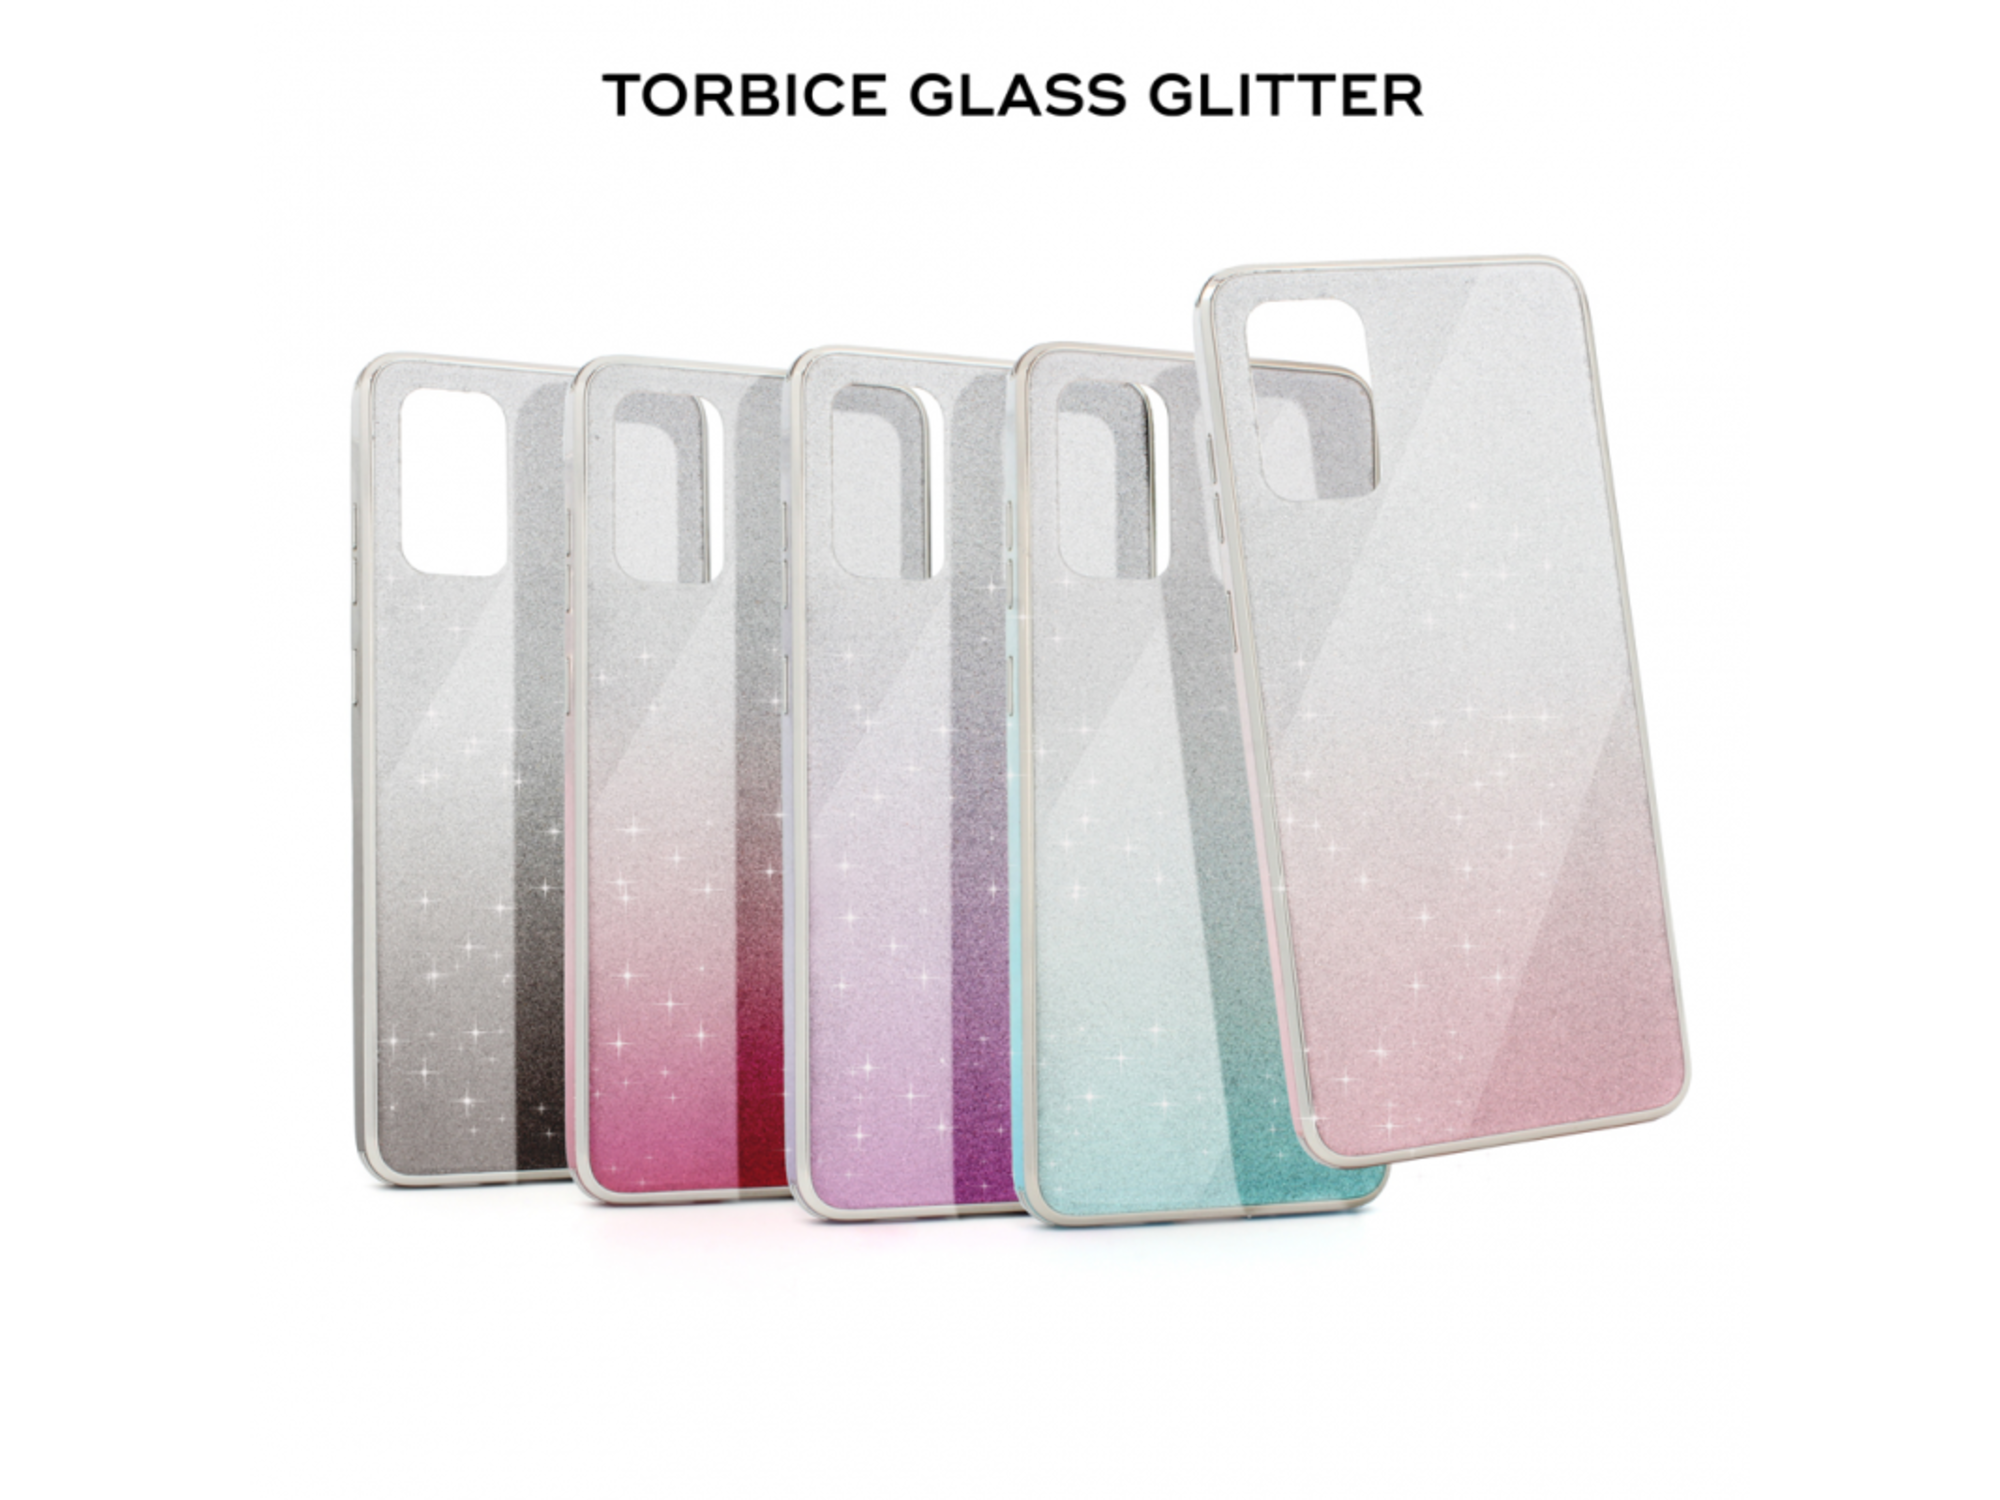 Torbica Glass Glitter za Samsung Galaxy S20 Plus A985F